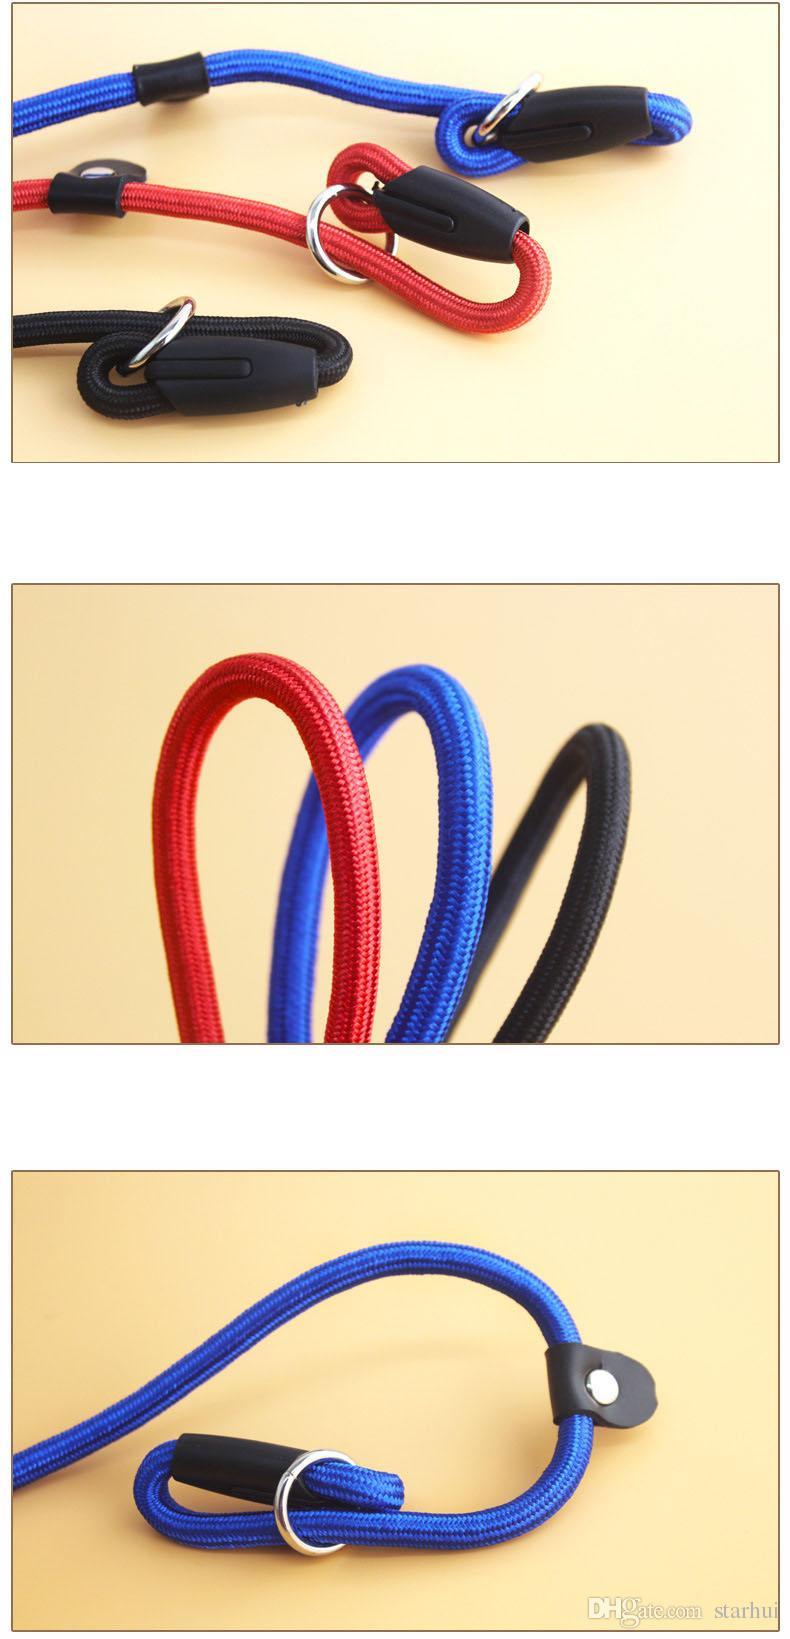 Pet Dog Nylon Rope Training Leash Slip Lead Strap Adjustable Traction Collar Pet Animals Rope Supplies Accessories 0.6*130cm WX9-656